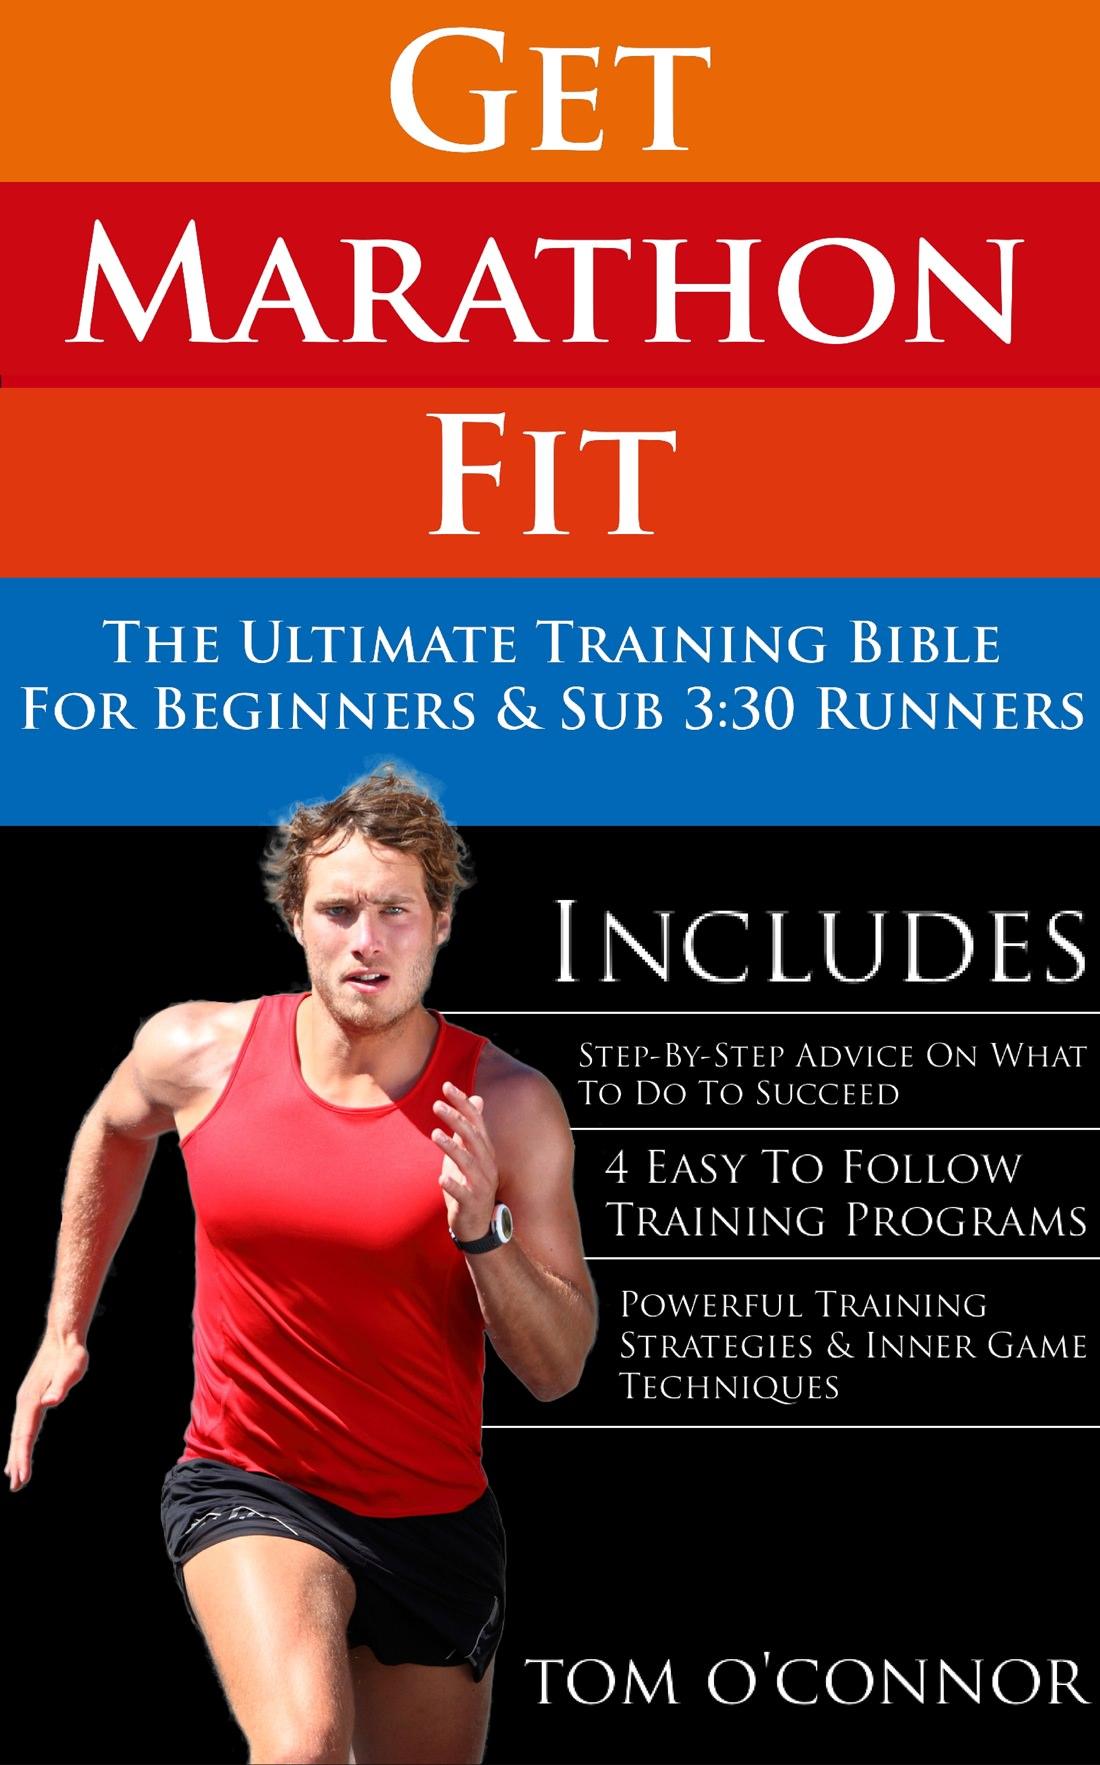 Ebook-Cover - Get Marathon Fit by Tom O'Connor